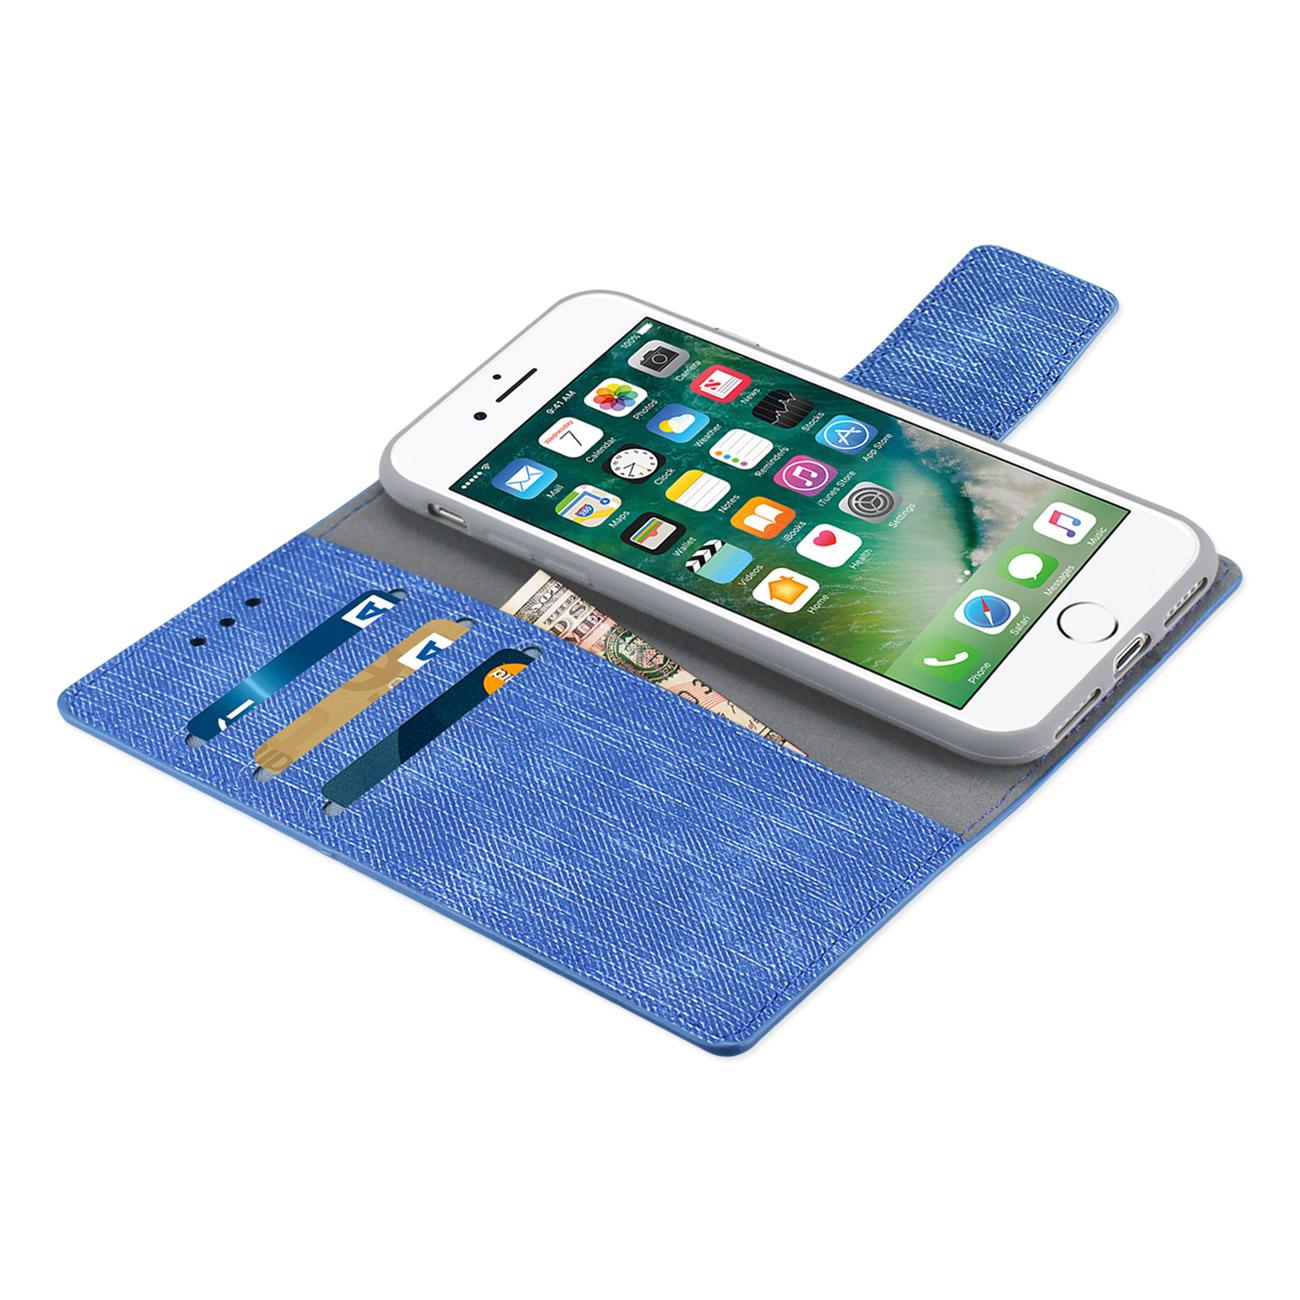 Case Iphone 8 7 Portefeuille De Denim Avec Coque Intrieure Goospery Milano Diary Pink Fc28 Iphone7nv 3